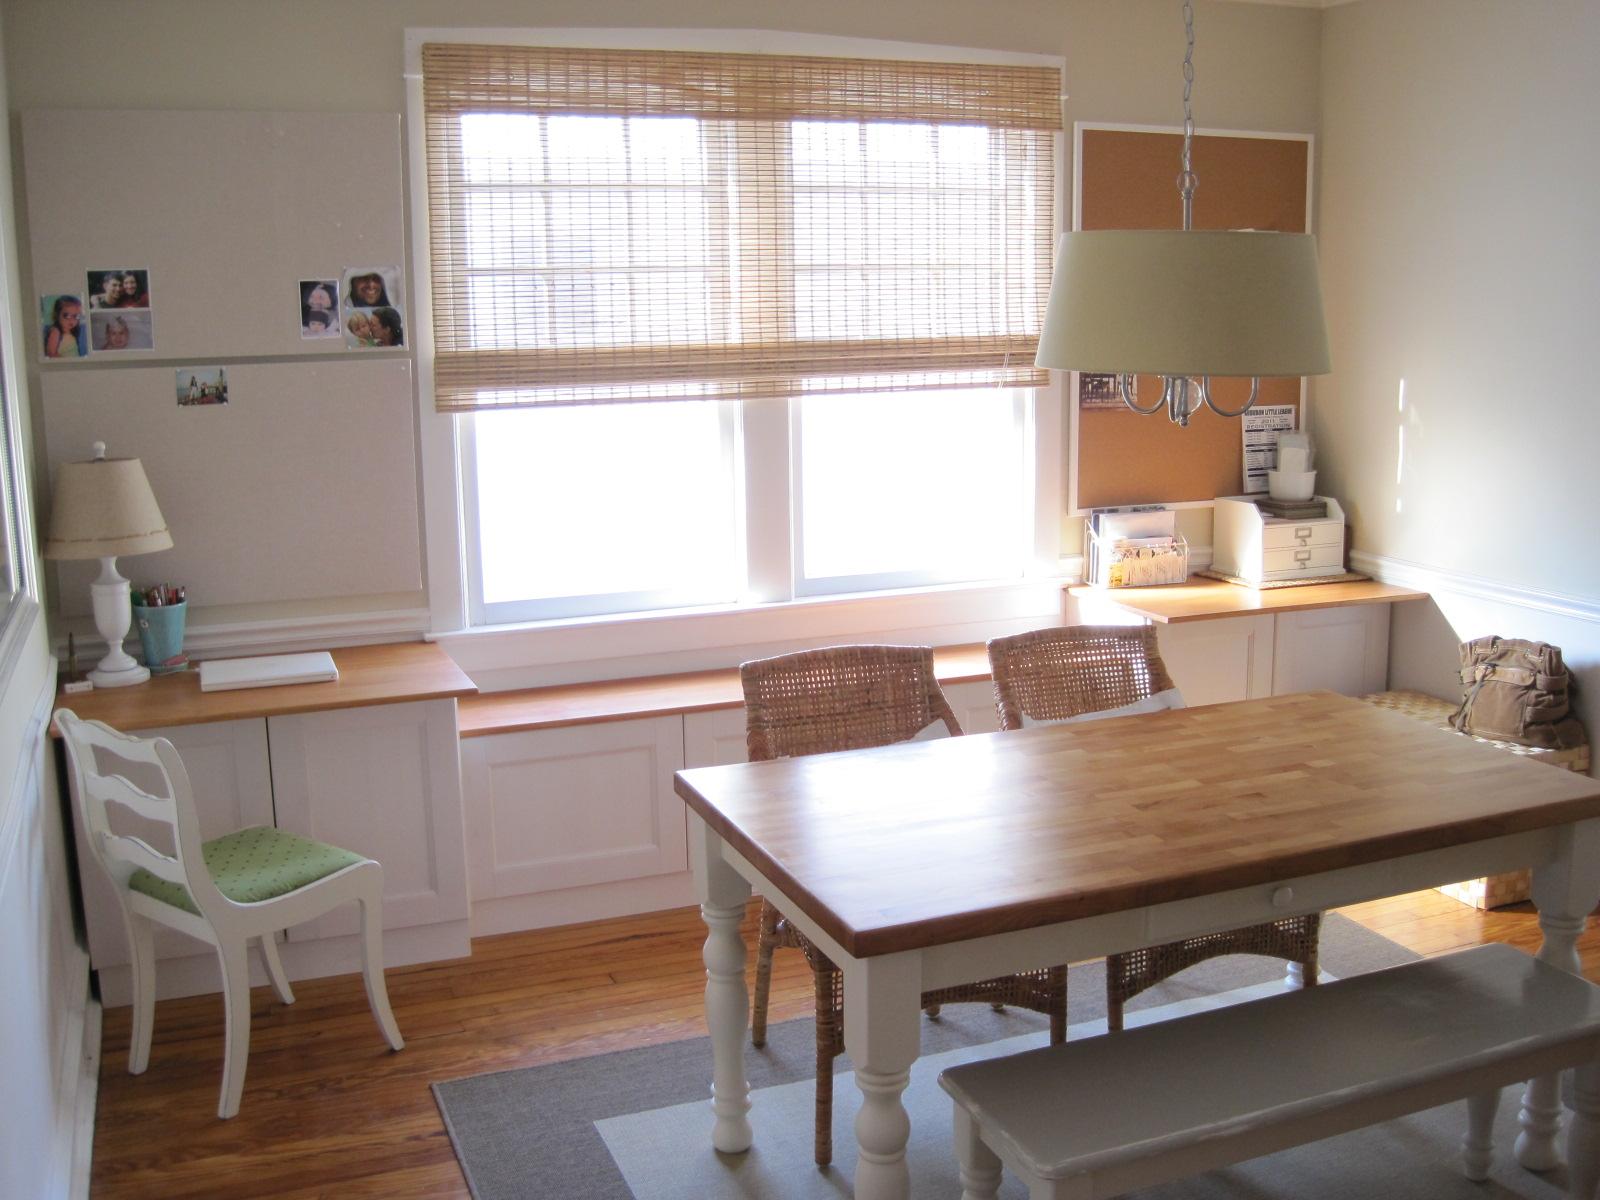 IKEA Ramsjo Kitchen Cabinets